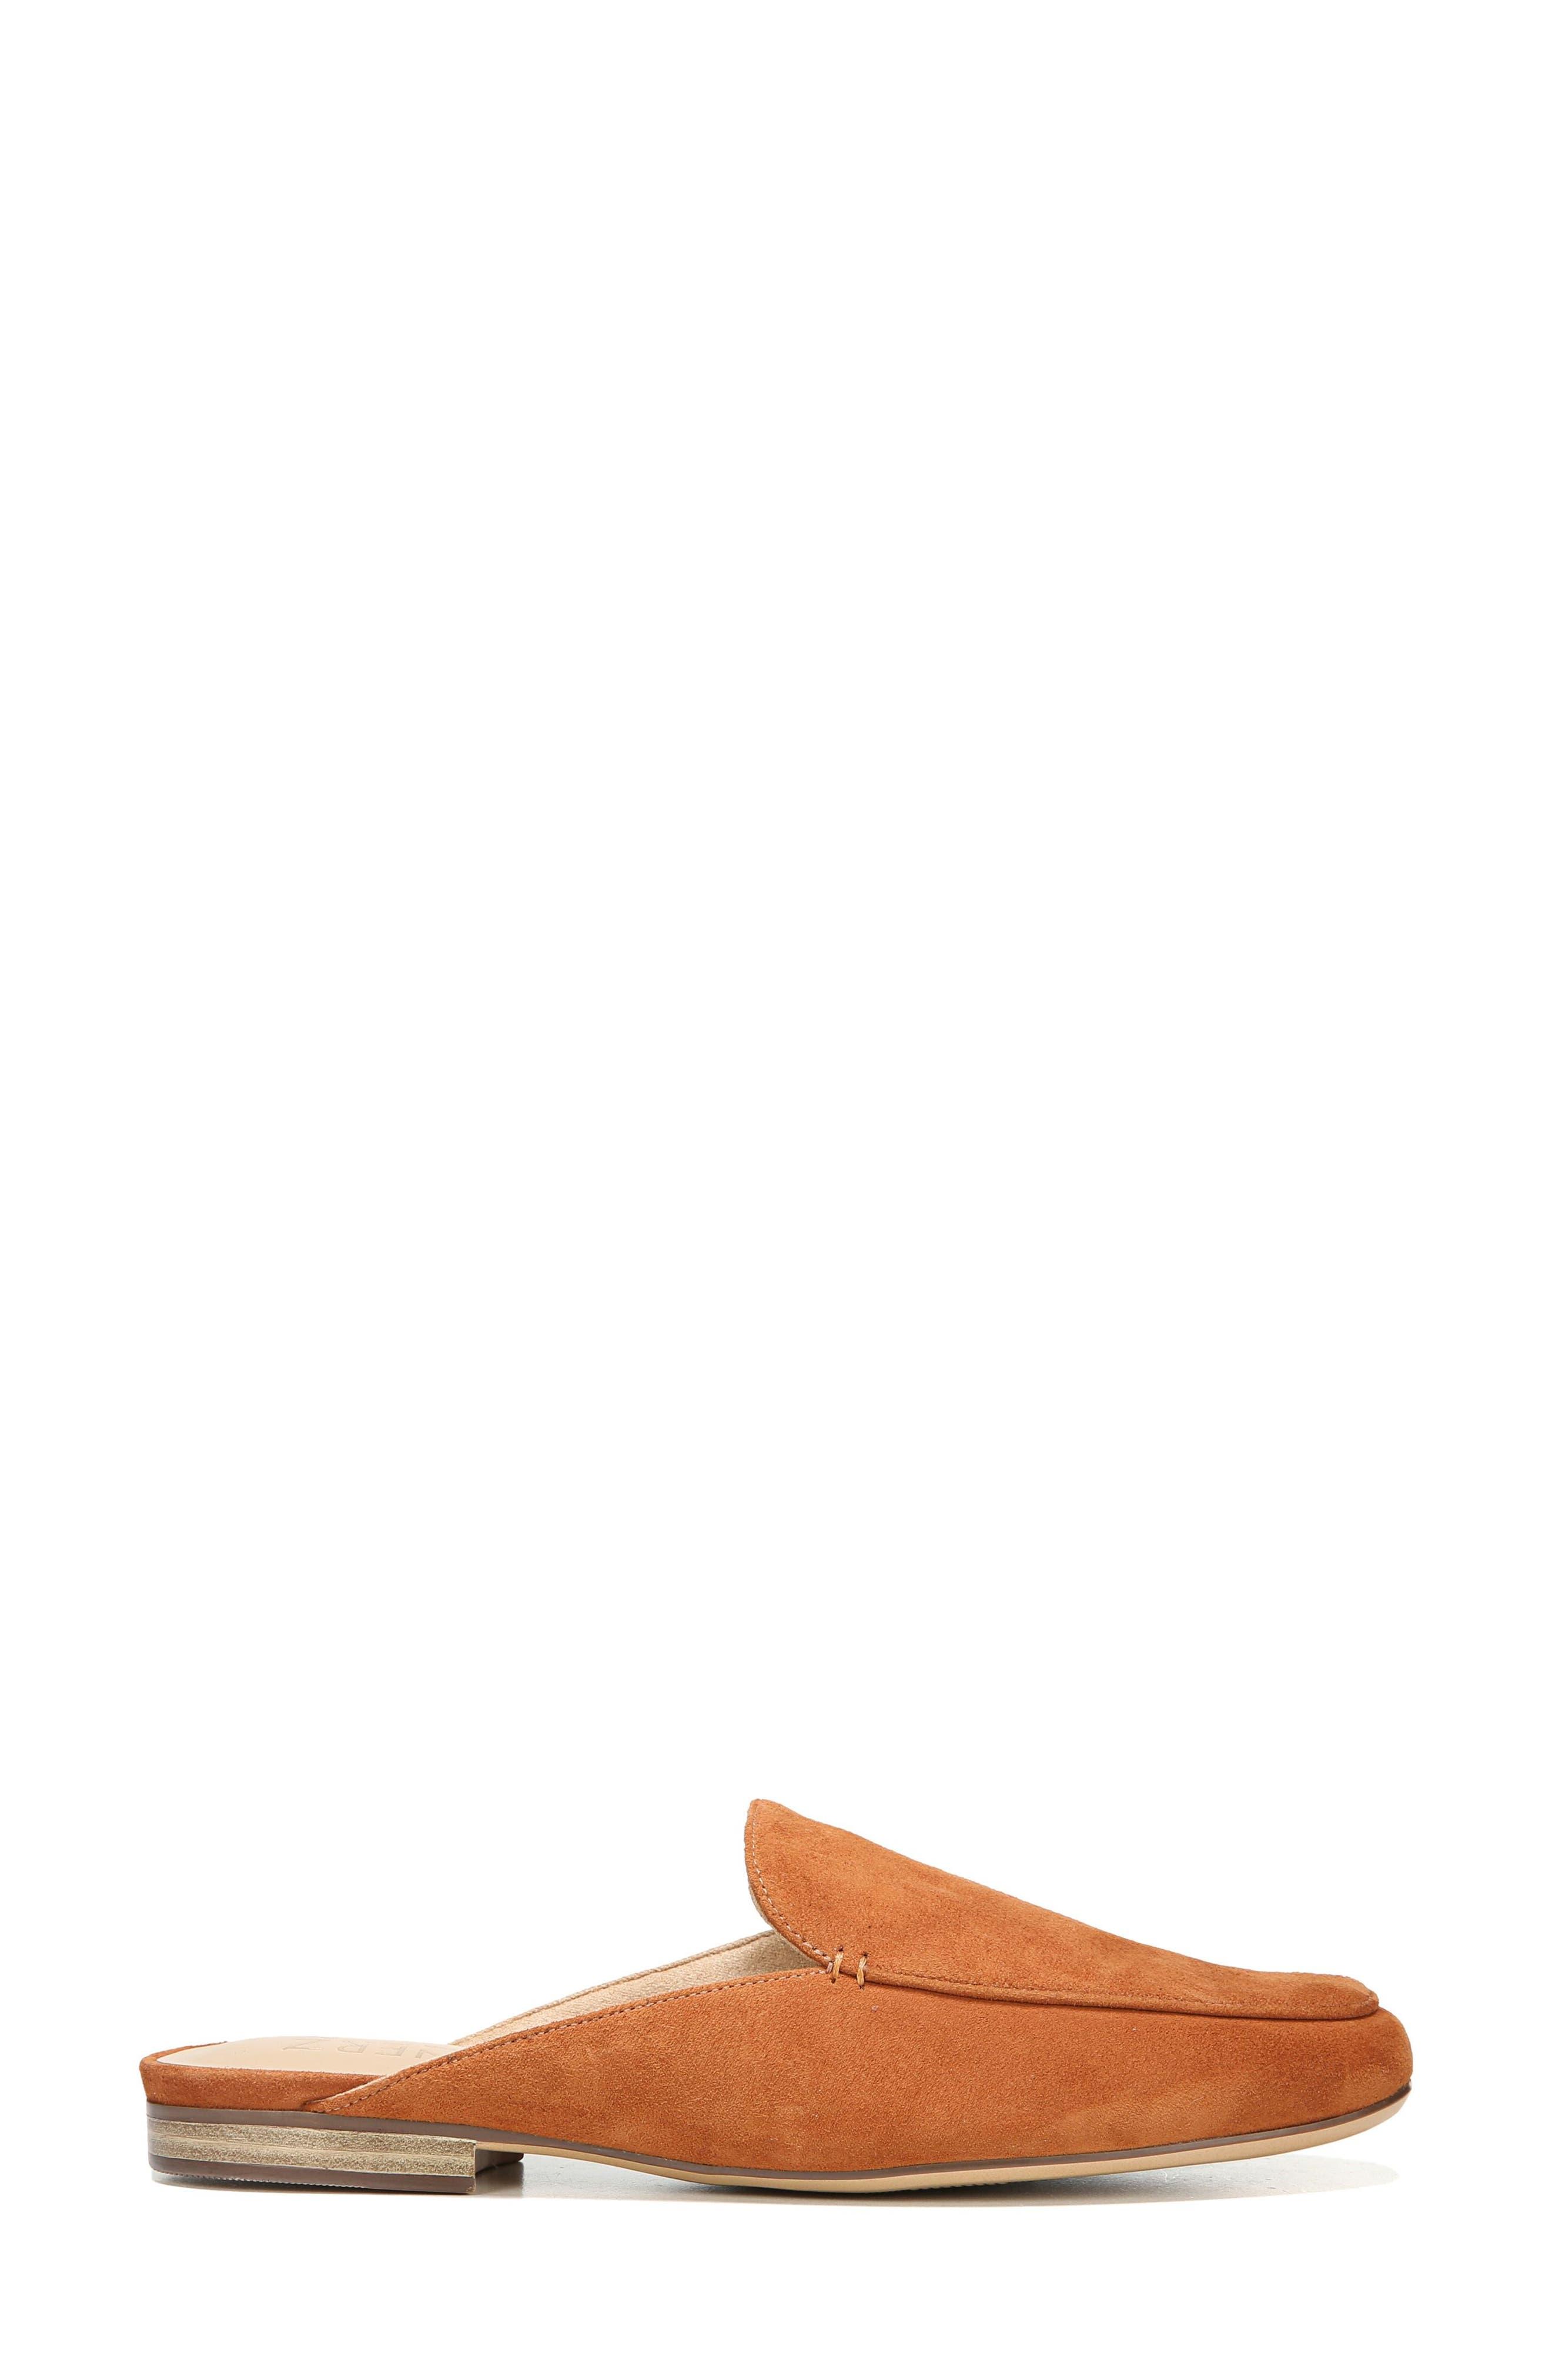 Eden Mule,                             Alternate thumbnail 3, color,                             Light Maple Leather